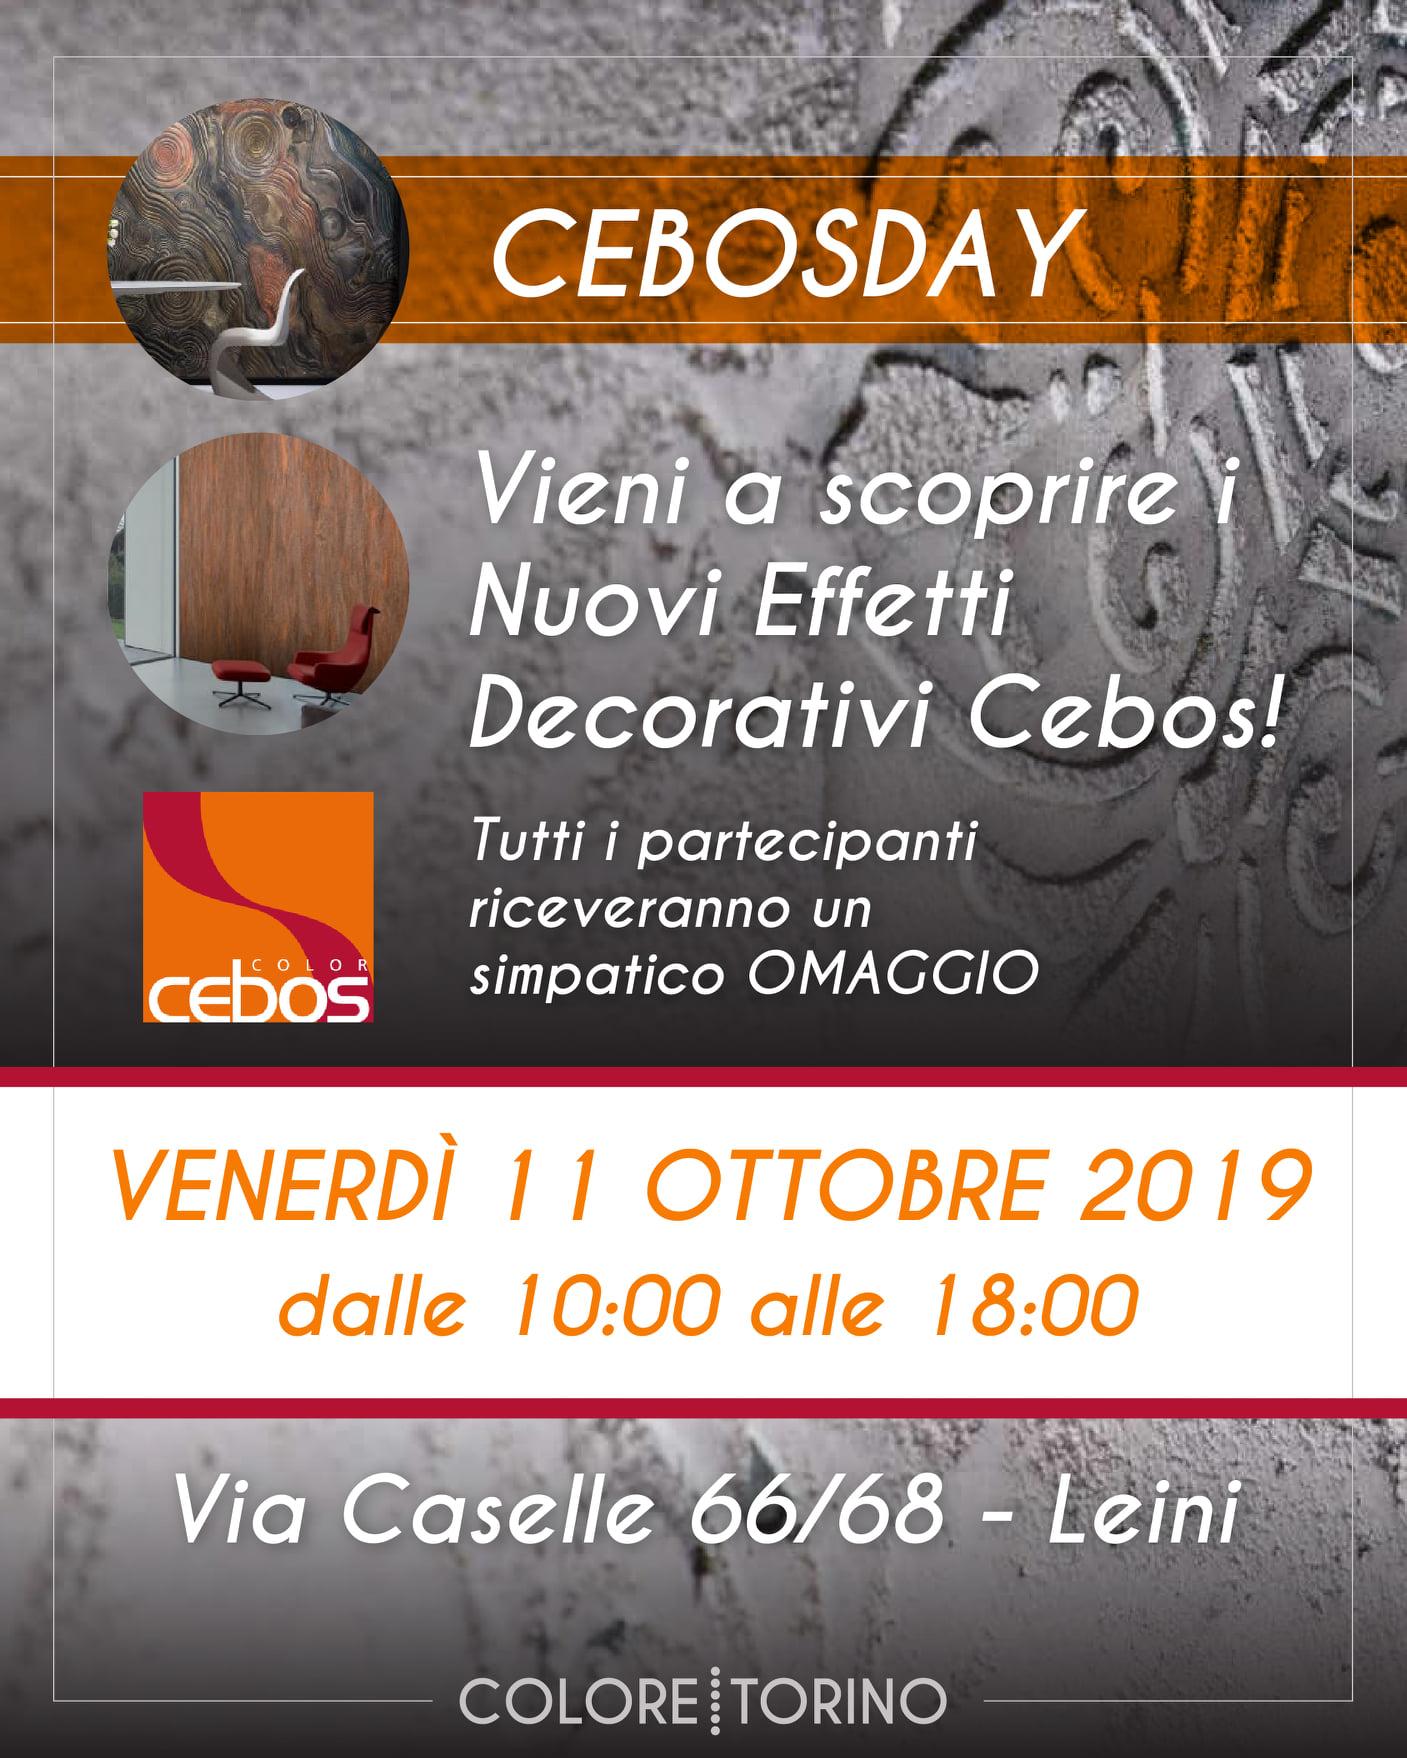 CebosDay da Colore Torino